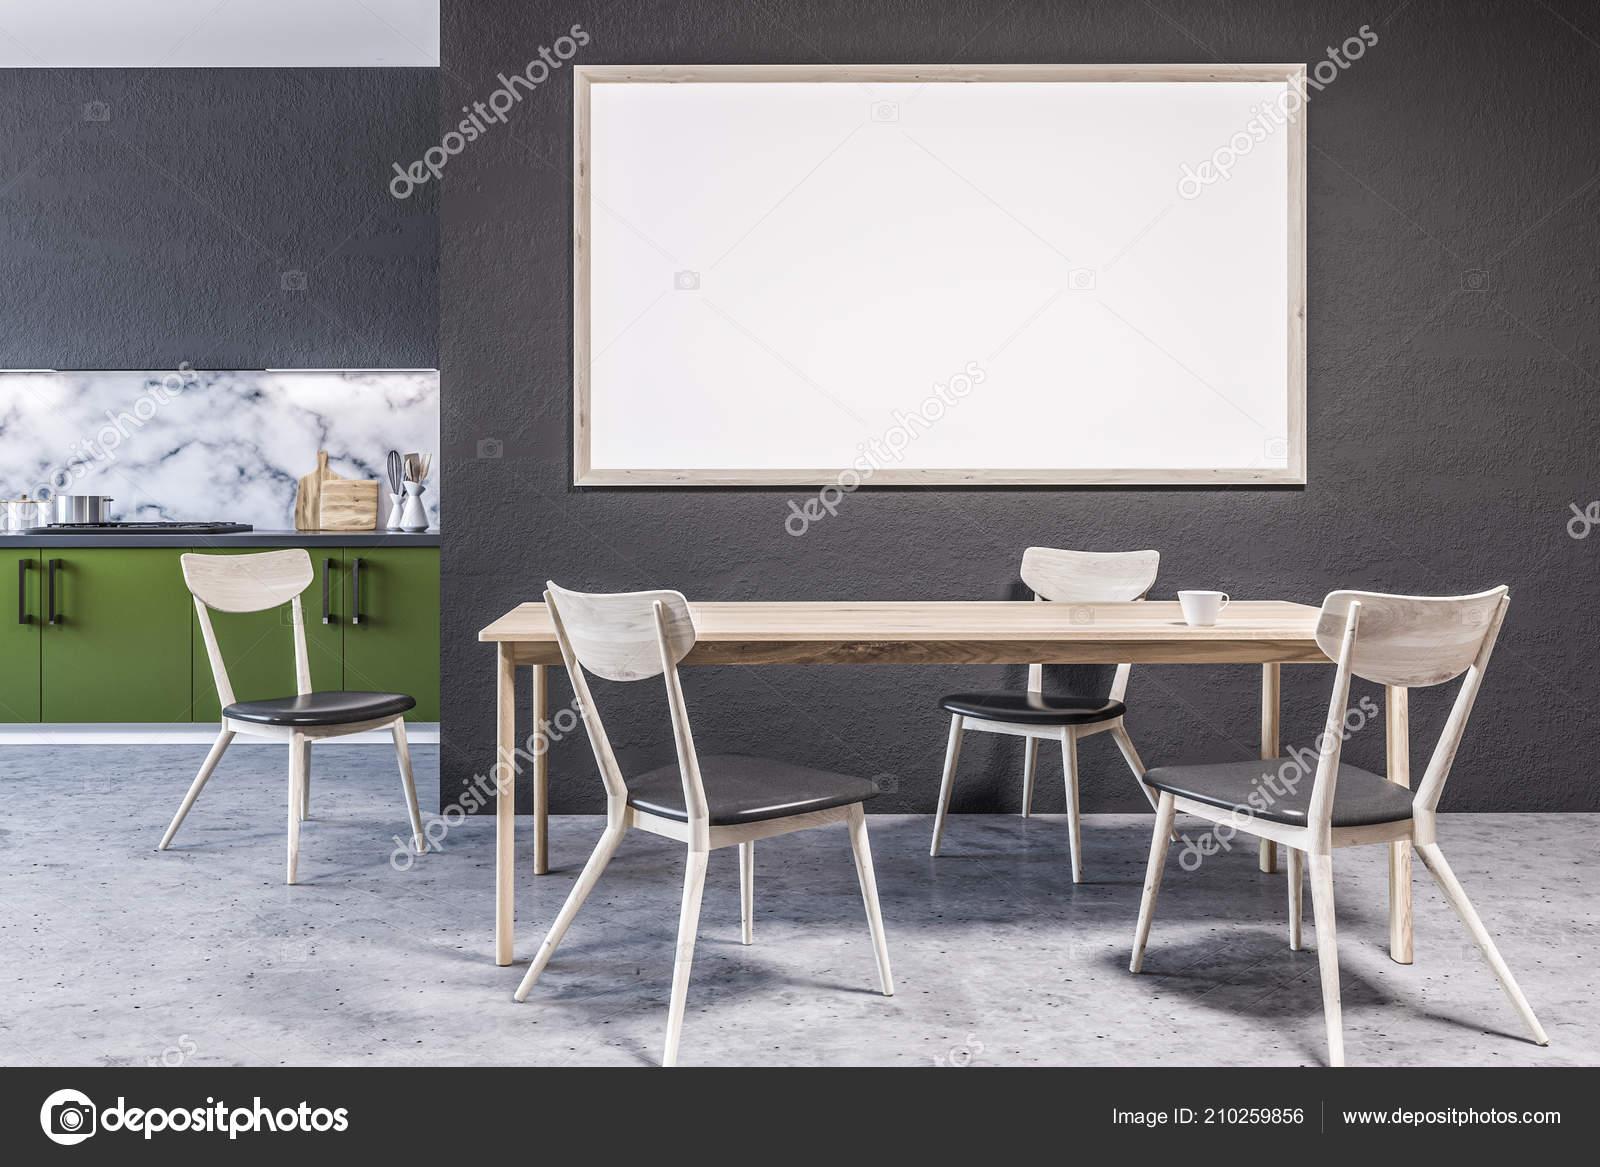 built in kitchen table tile for wall 现代大理石墙厨房内部的大窗户混凝土地板和绿色的台面与内置的家电有椅子 现代大理石墙厨房内部的大窗户 混凝土地板和绿色的台面与内置的家电 有椅子的木制桌子 3d 渲染模拟横幅框架 照片作者denisismagilov